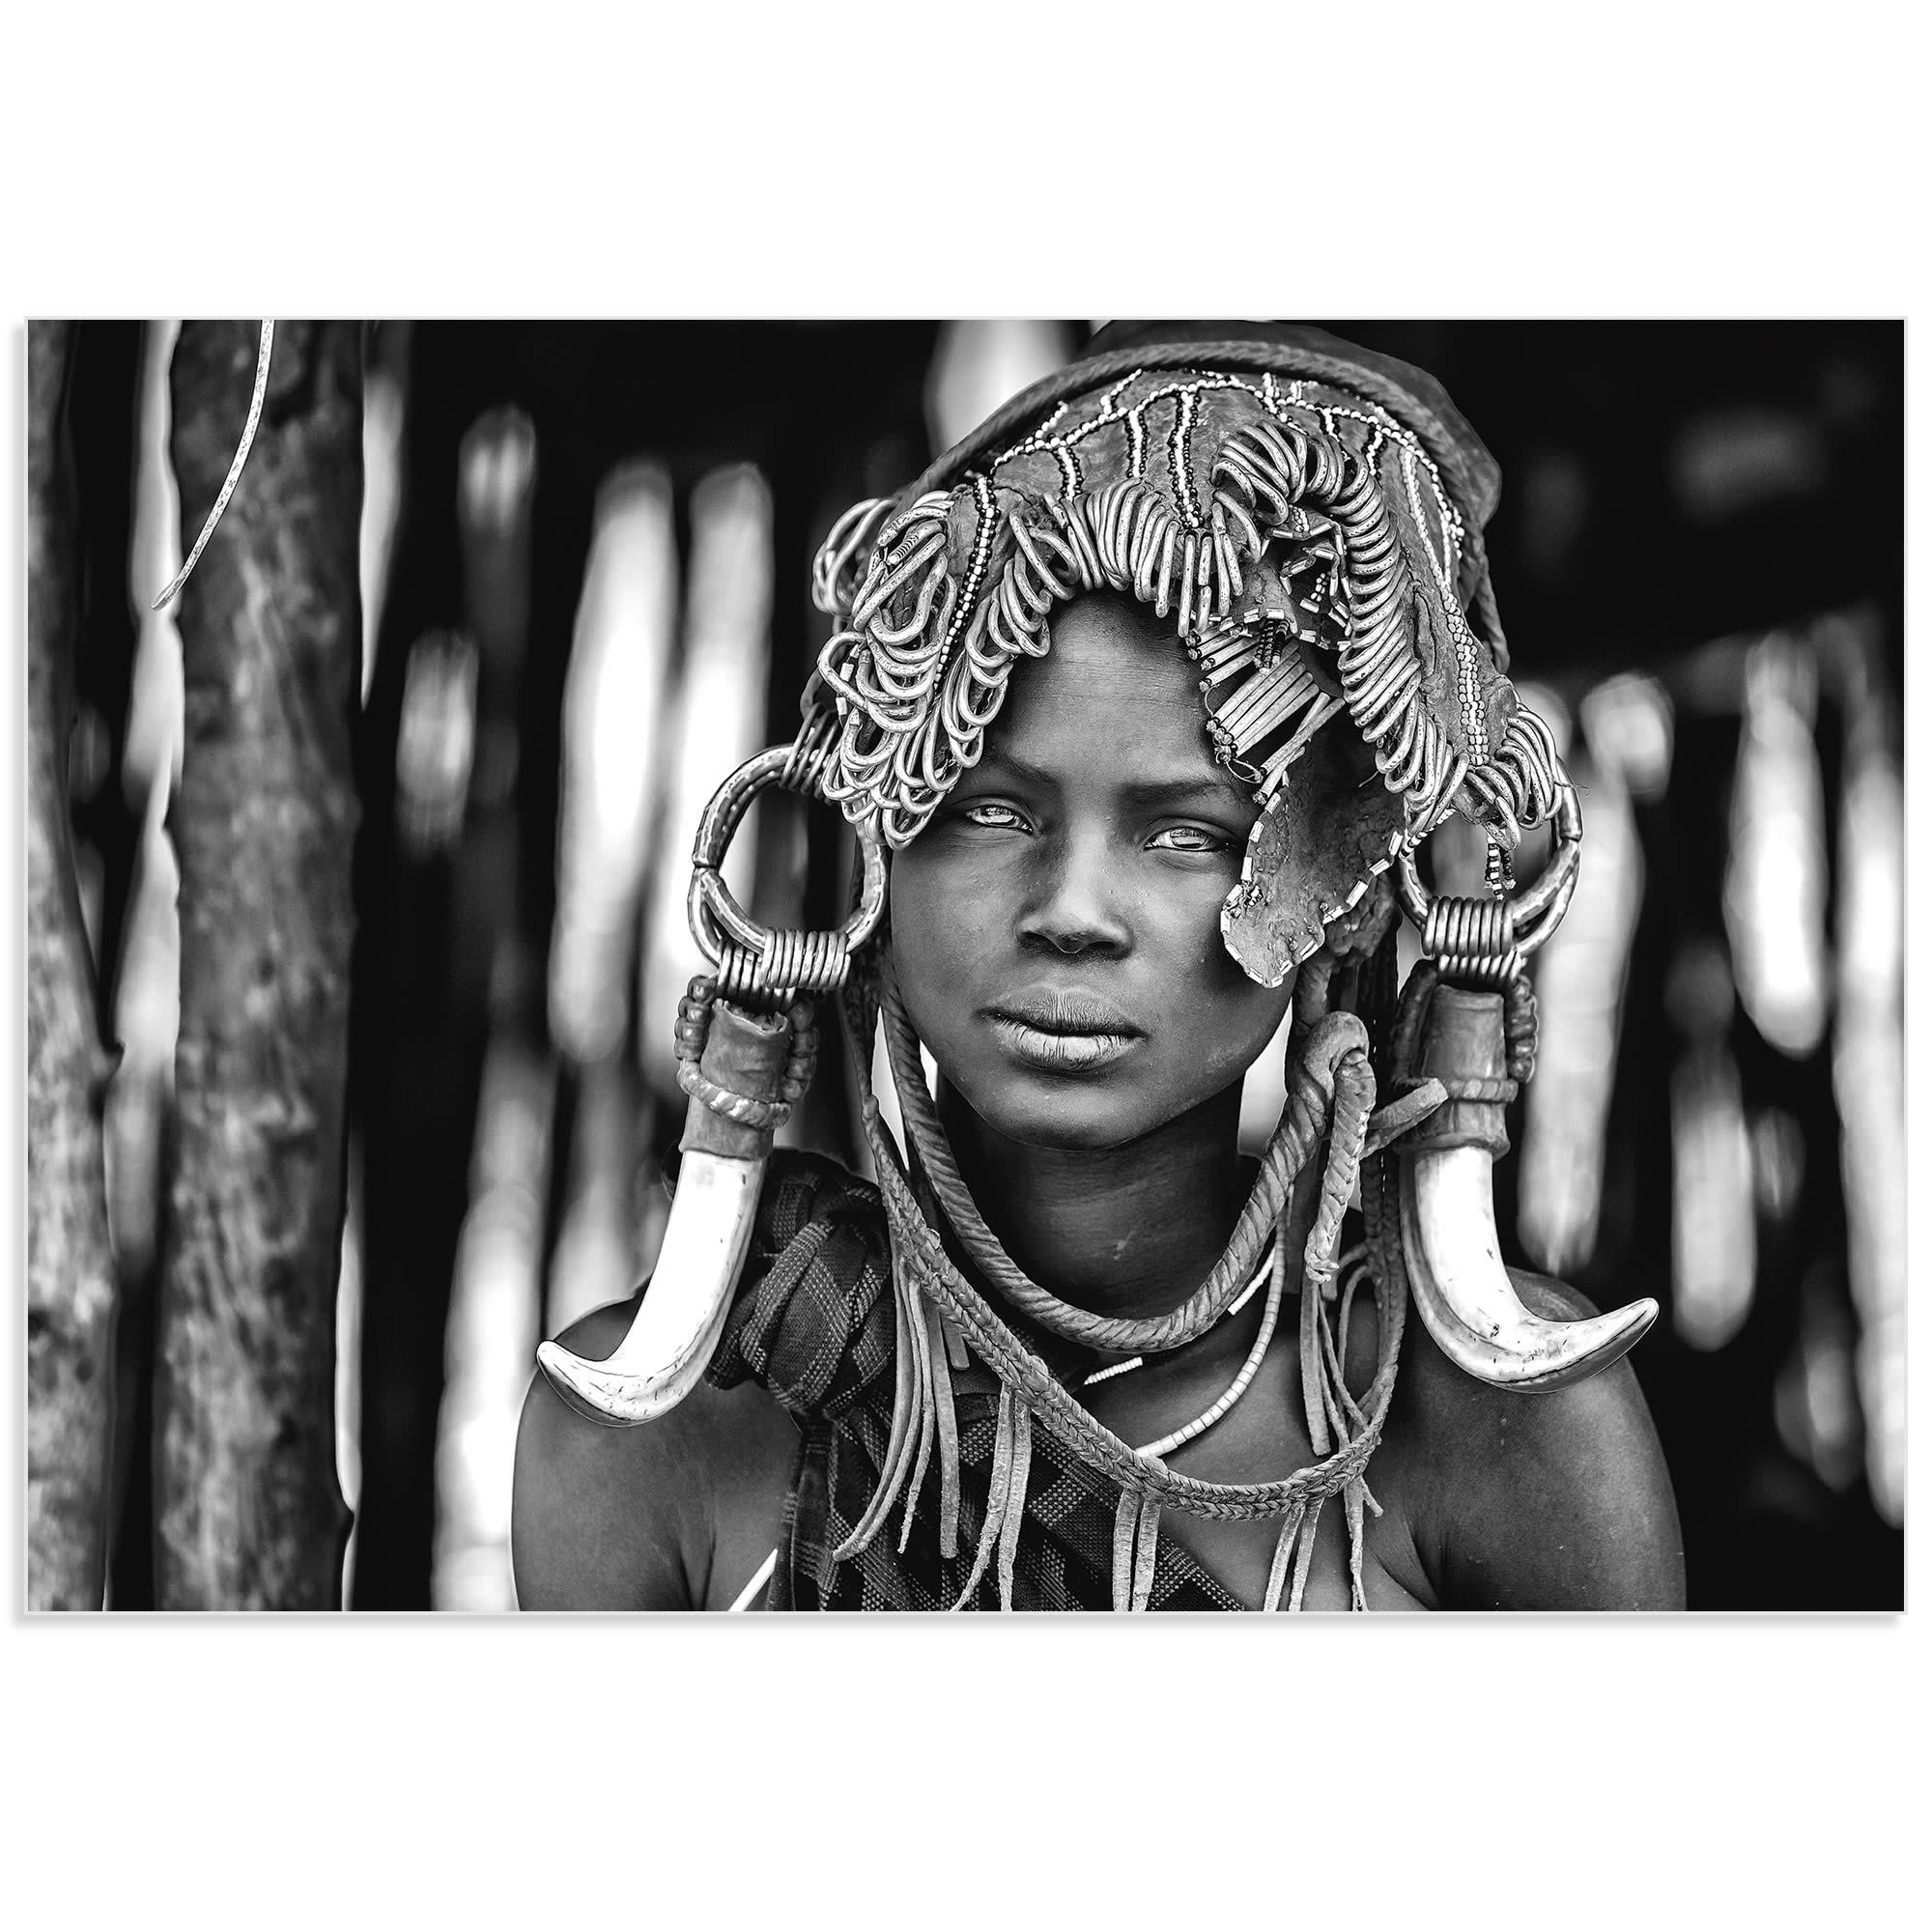 Mursi Headdress by Vedran Vidak - Black & White Indigenous Art on Metal or Acrylic - Alternate View 2